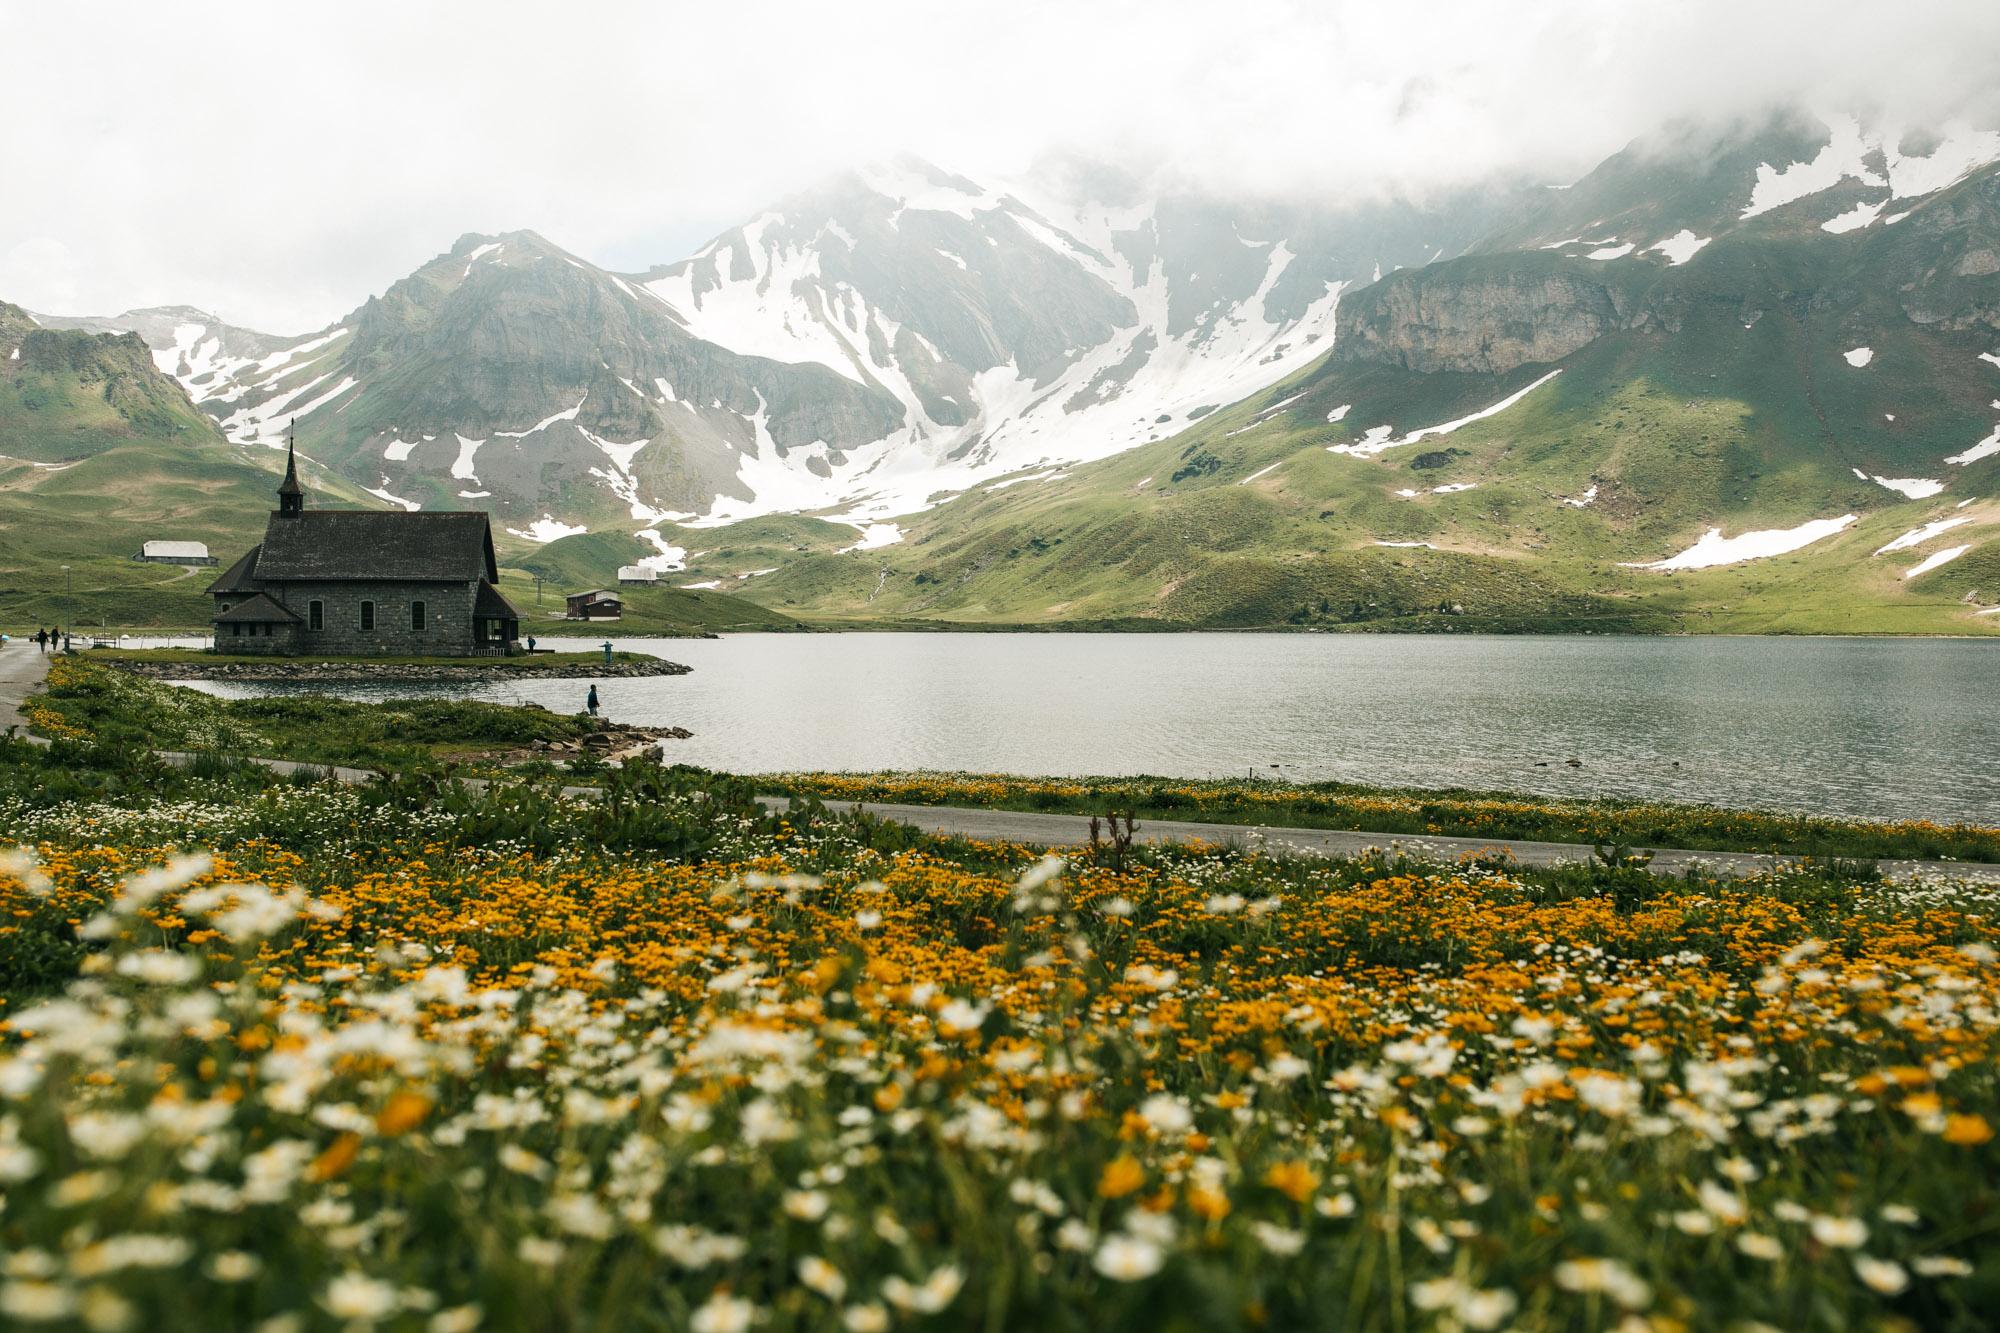 SwitzerlandBlog_HBGOODIE2018 (38 of 58).jpg